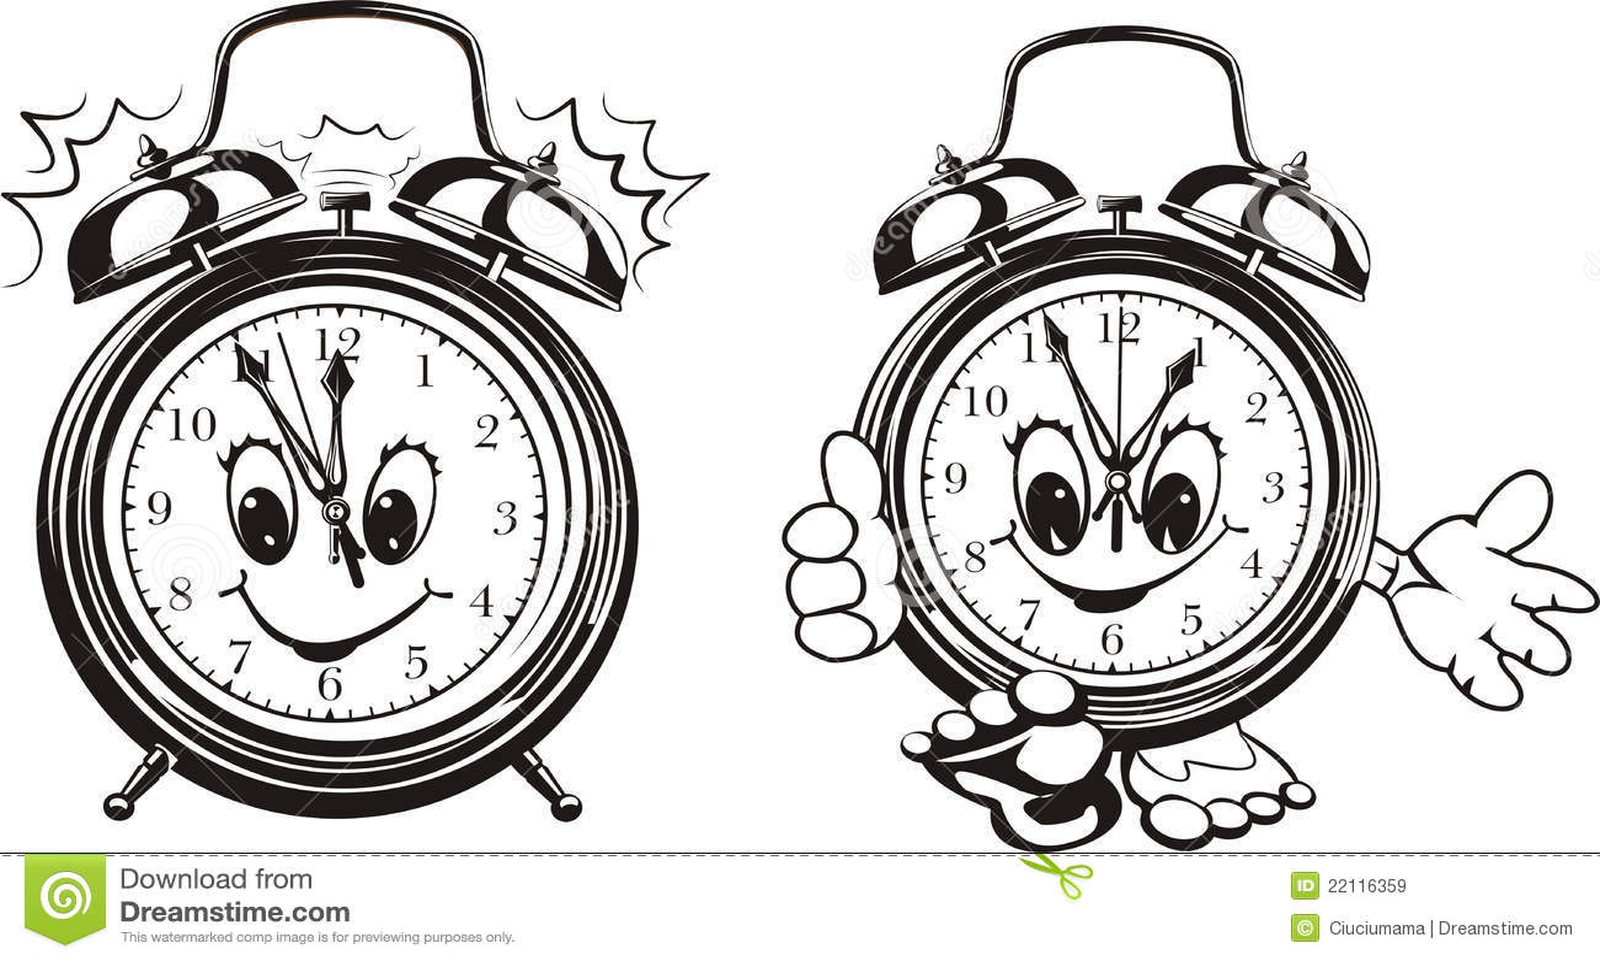 Two Alarm Clocks - Black & White Royalty Free Stock Images ...